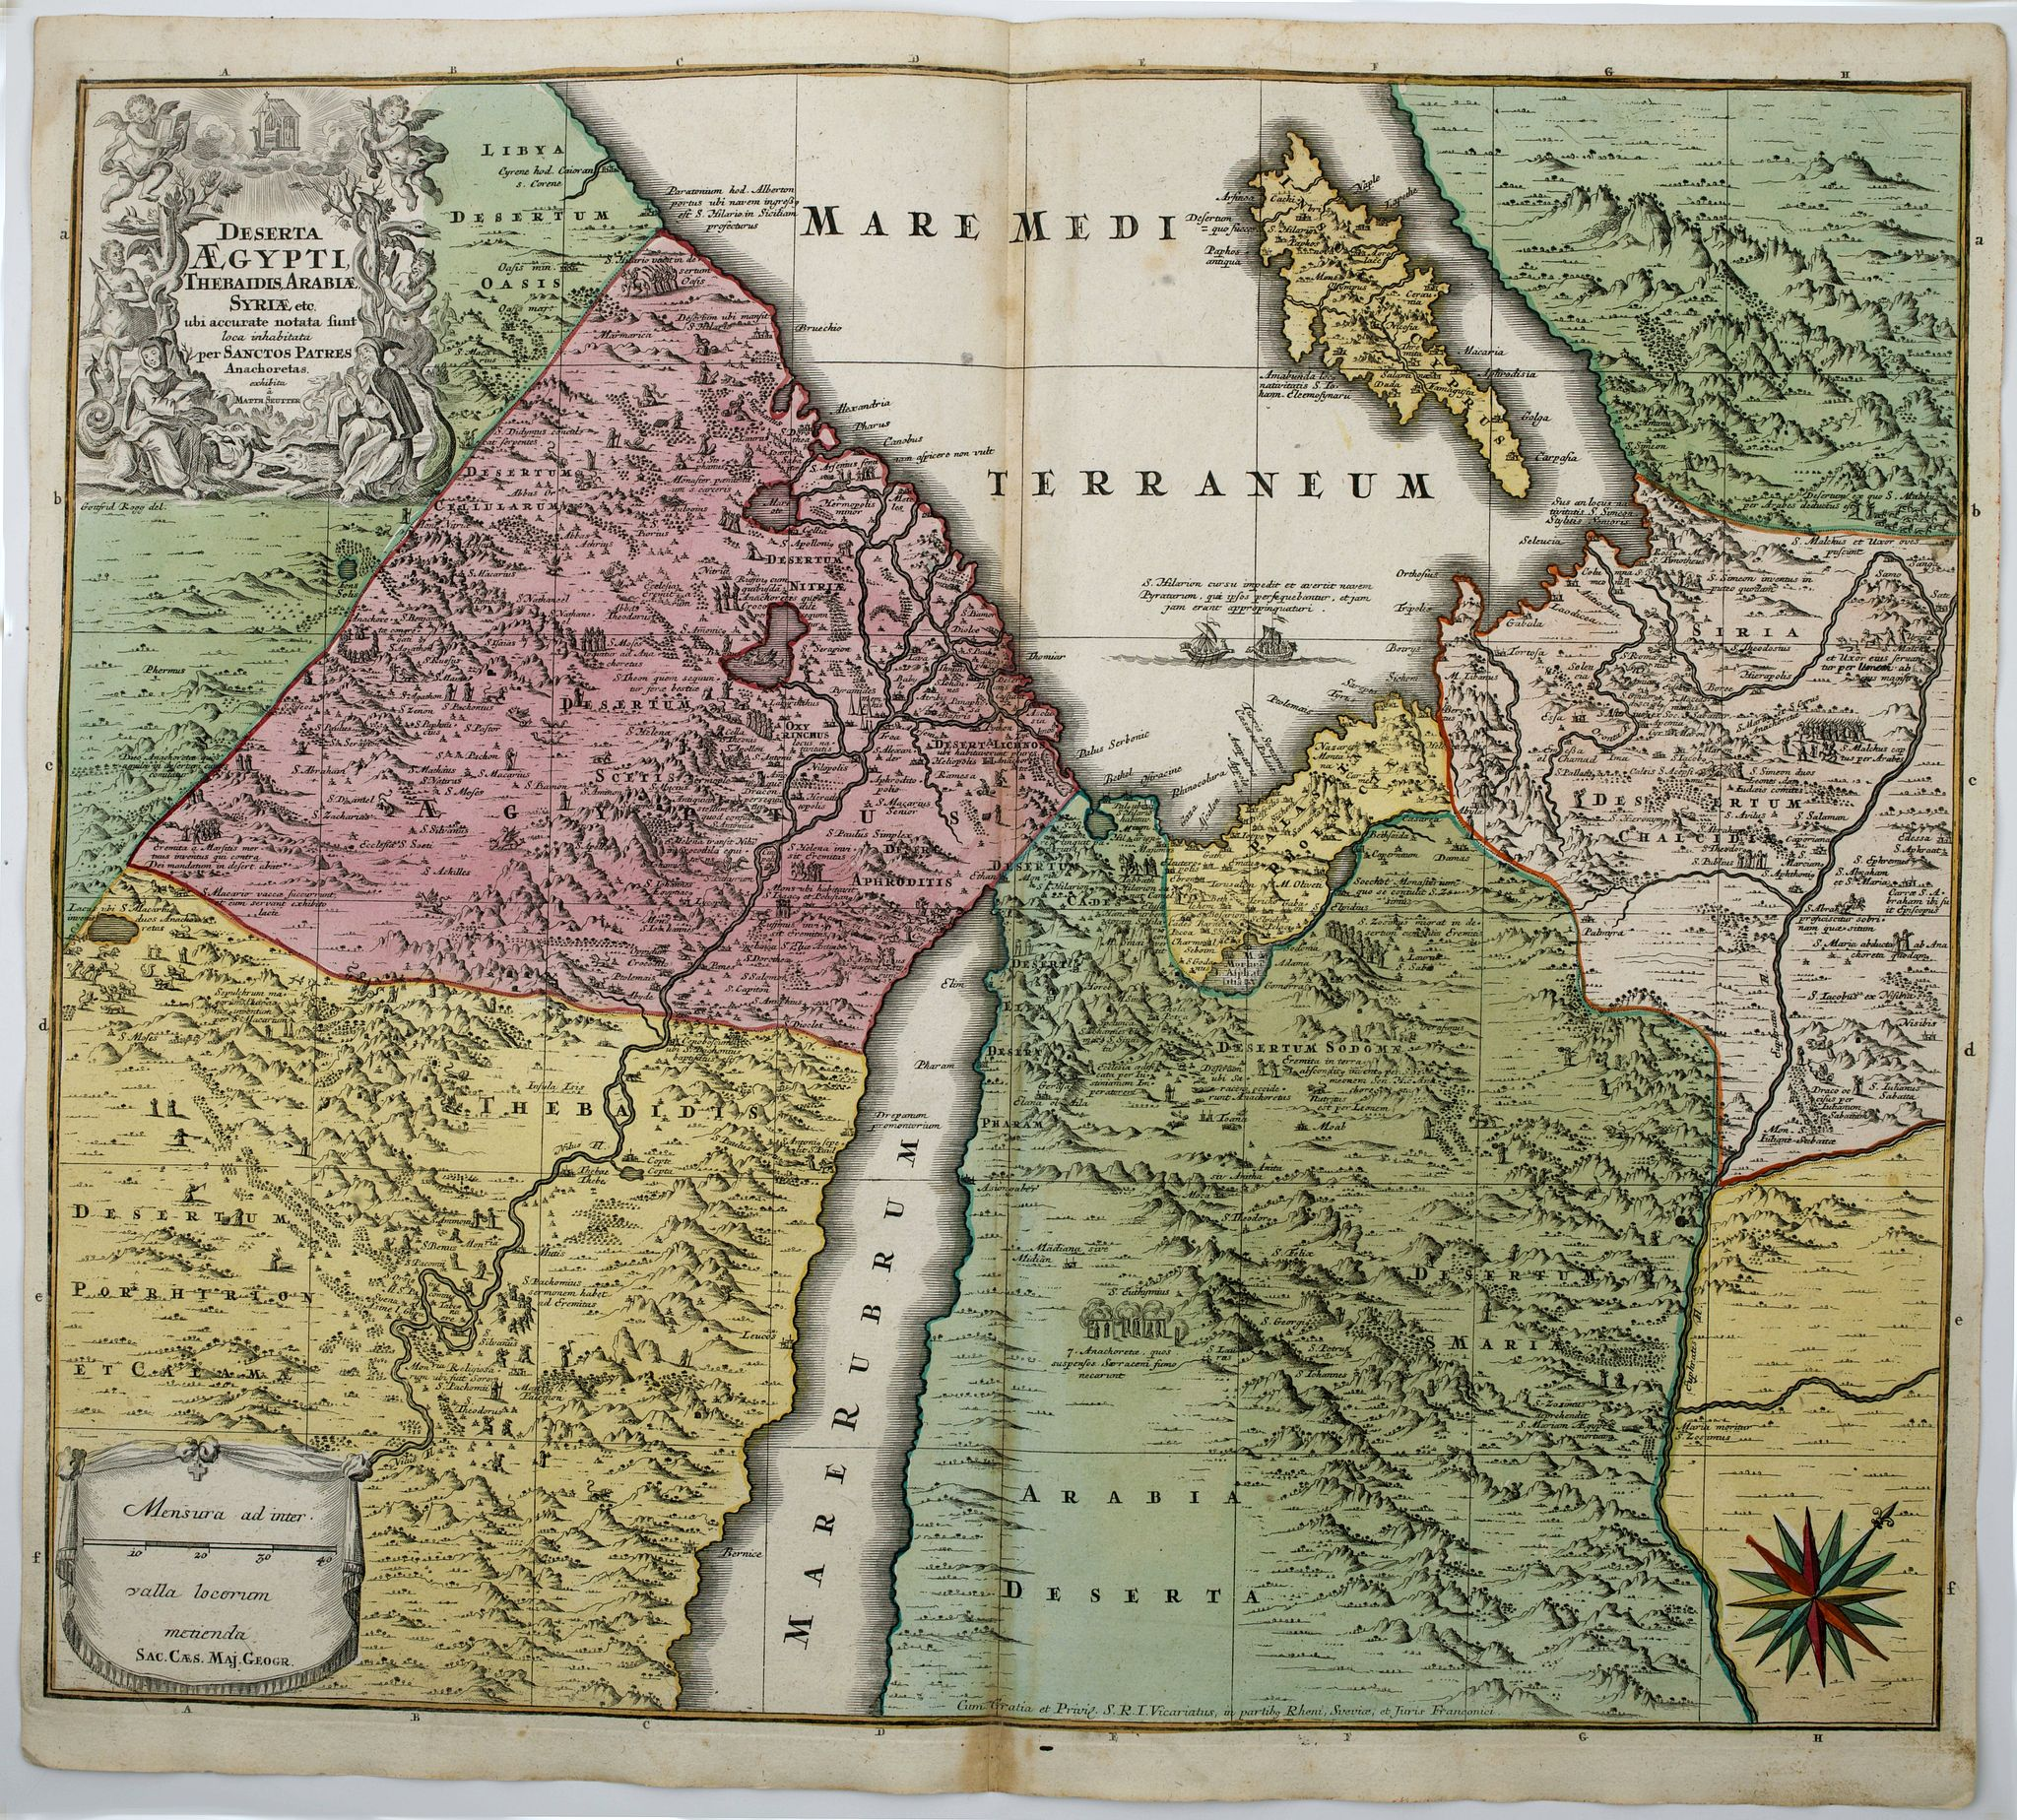 SEUTTER, M. - Deserta Aegypti Thebaidis, Arabiae, Syriae etc.